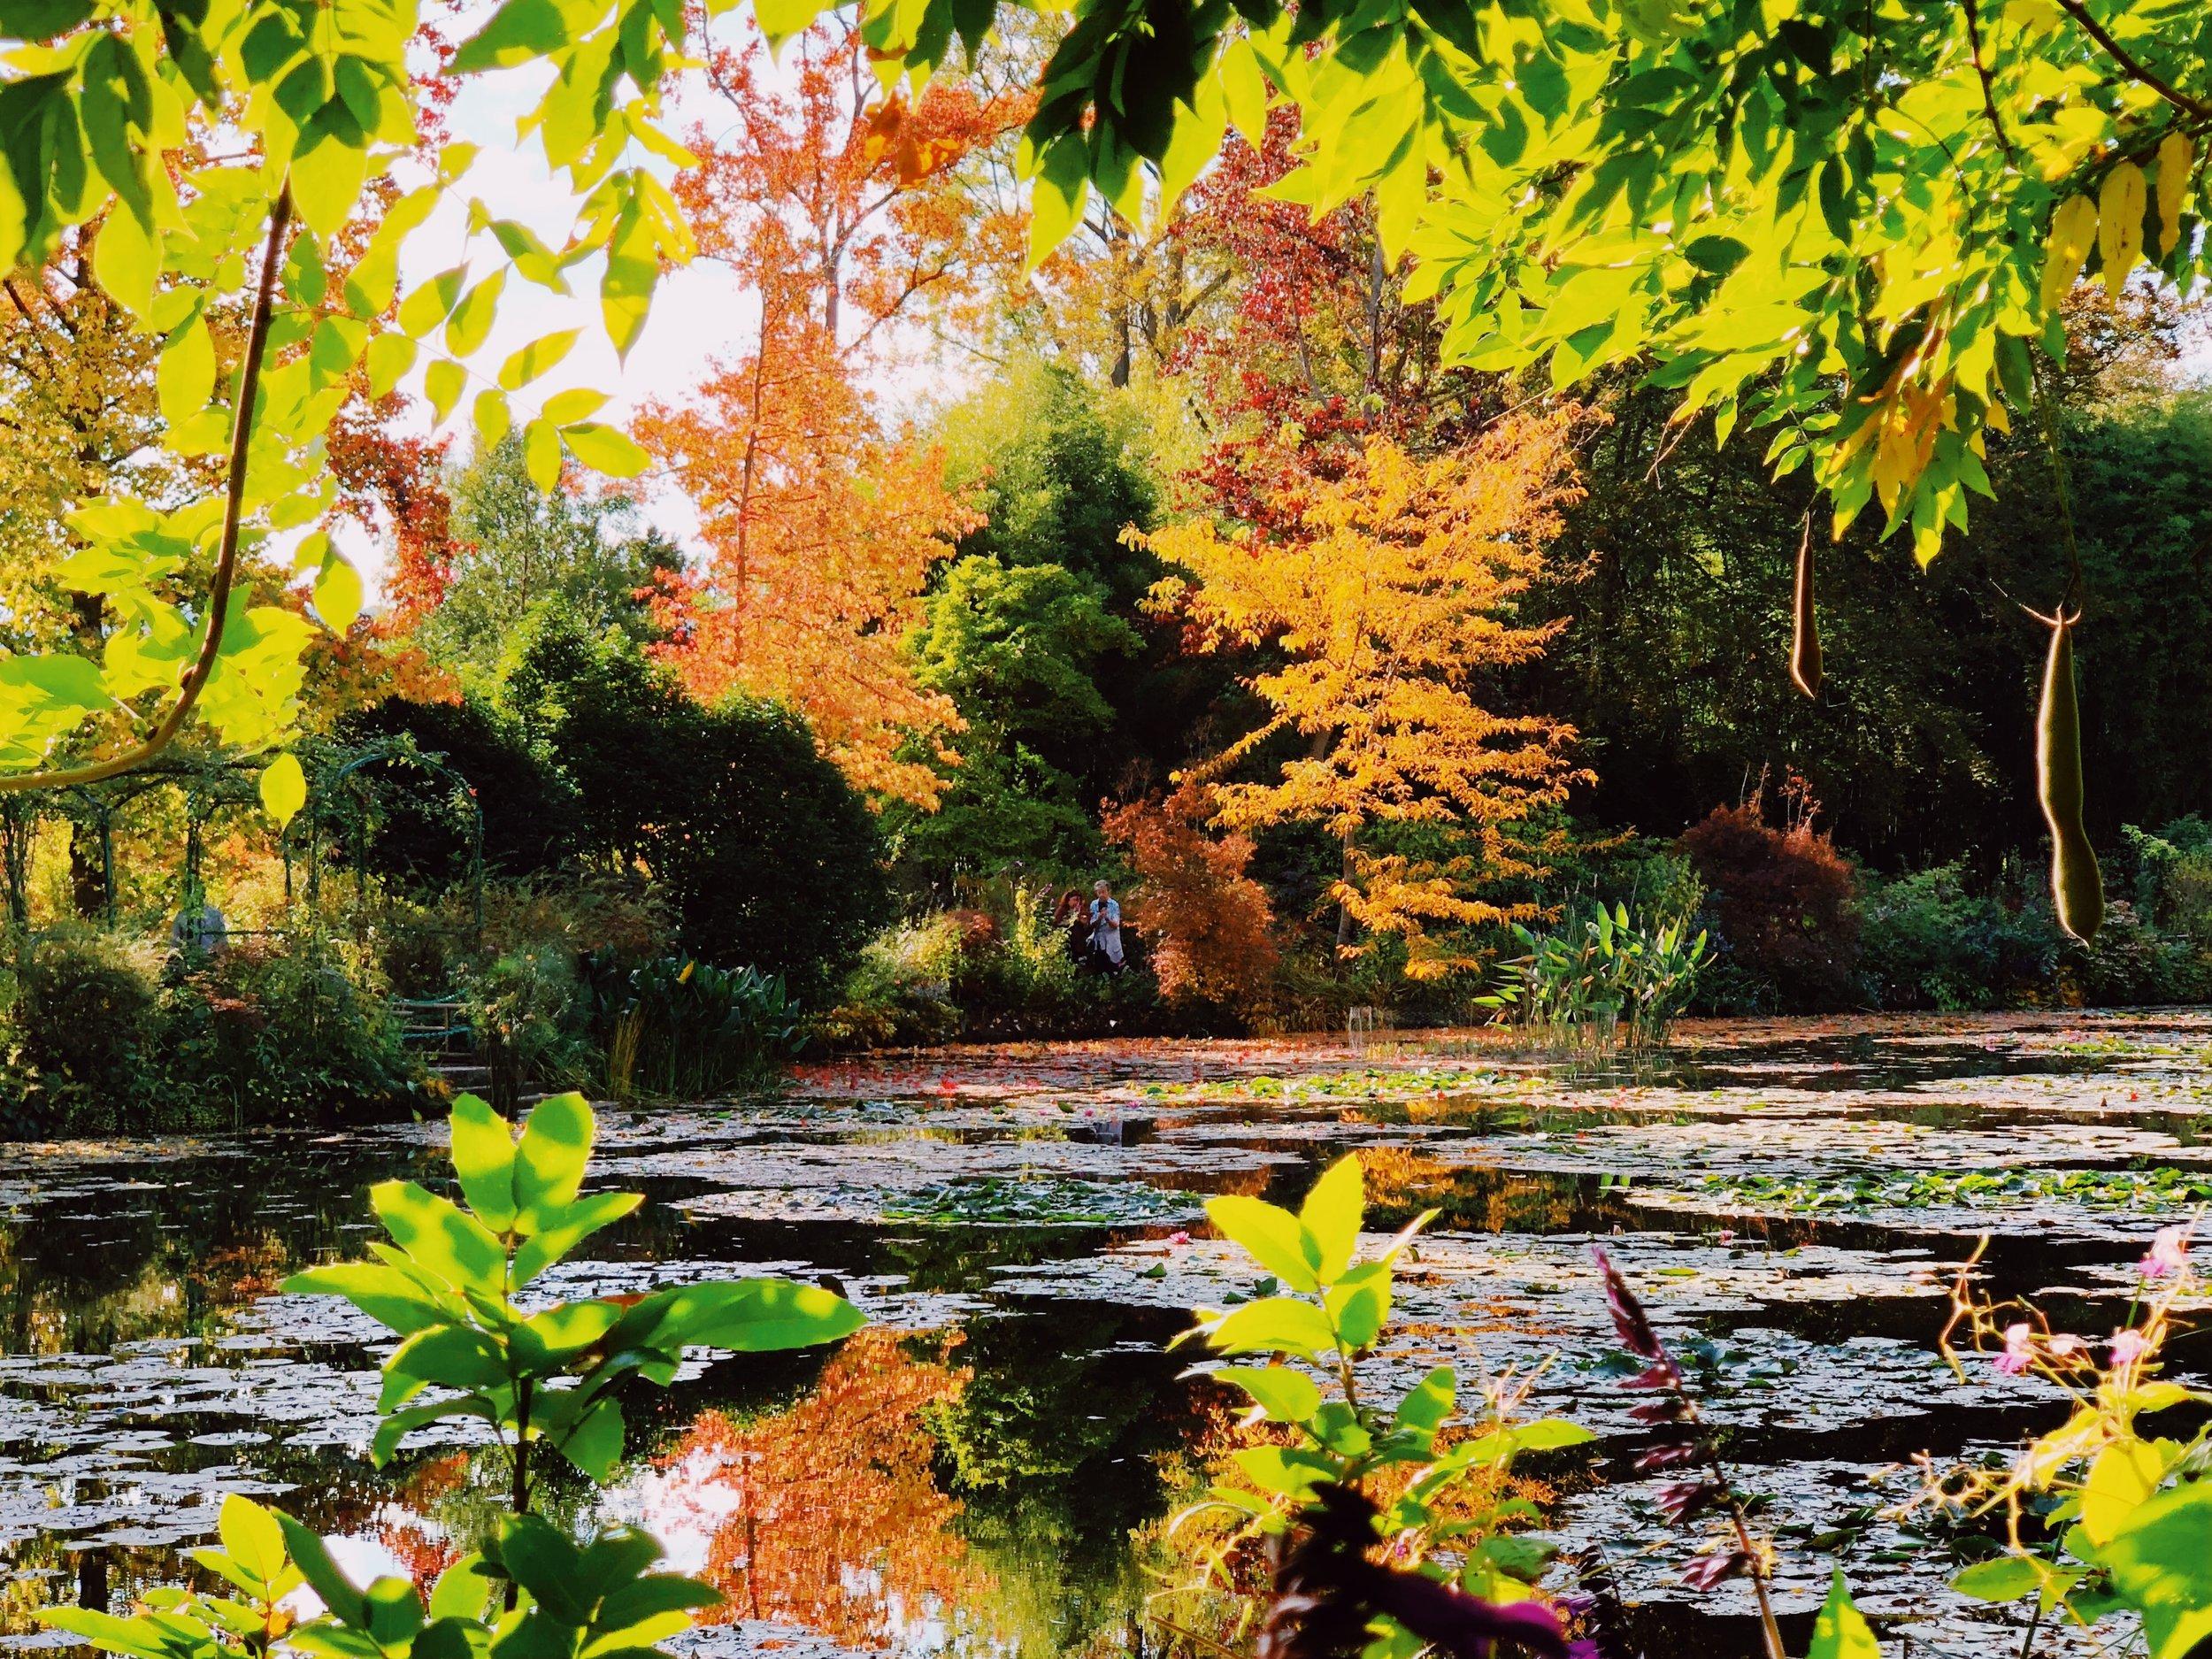 Europe is fantastic in autumn.